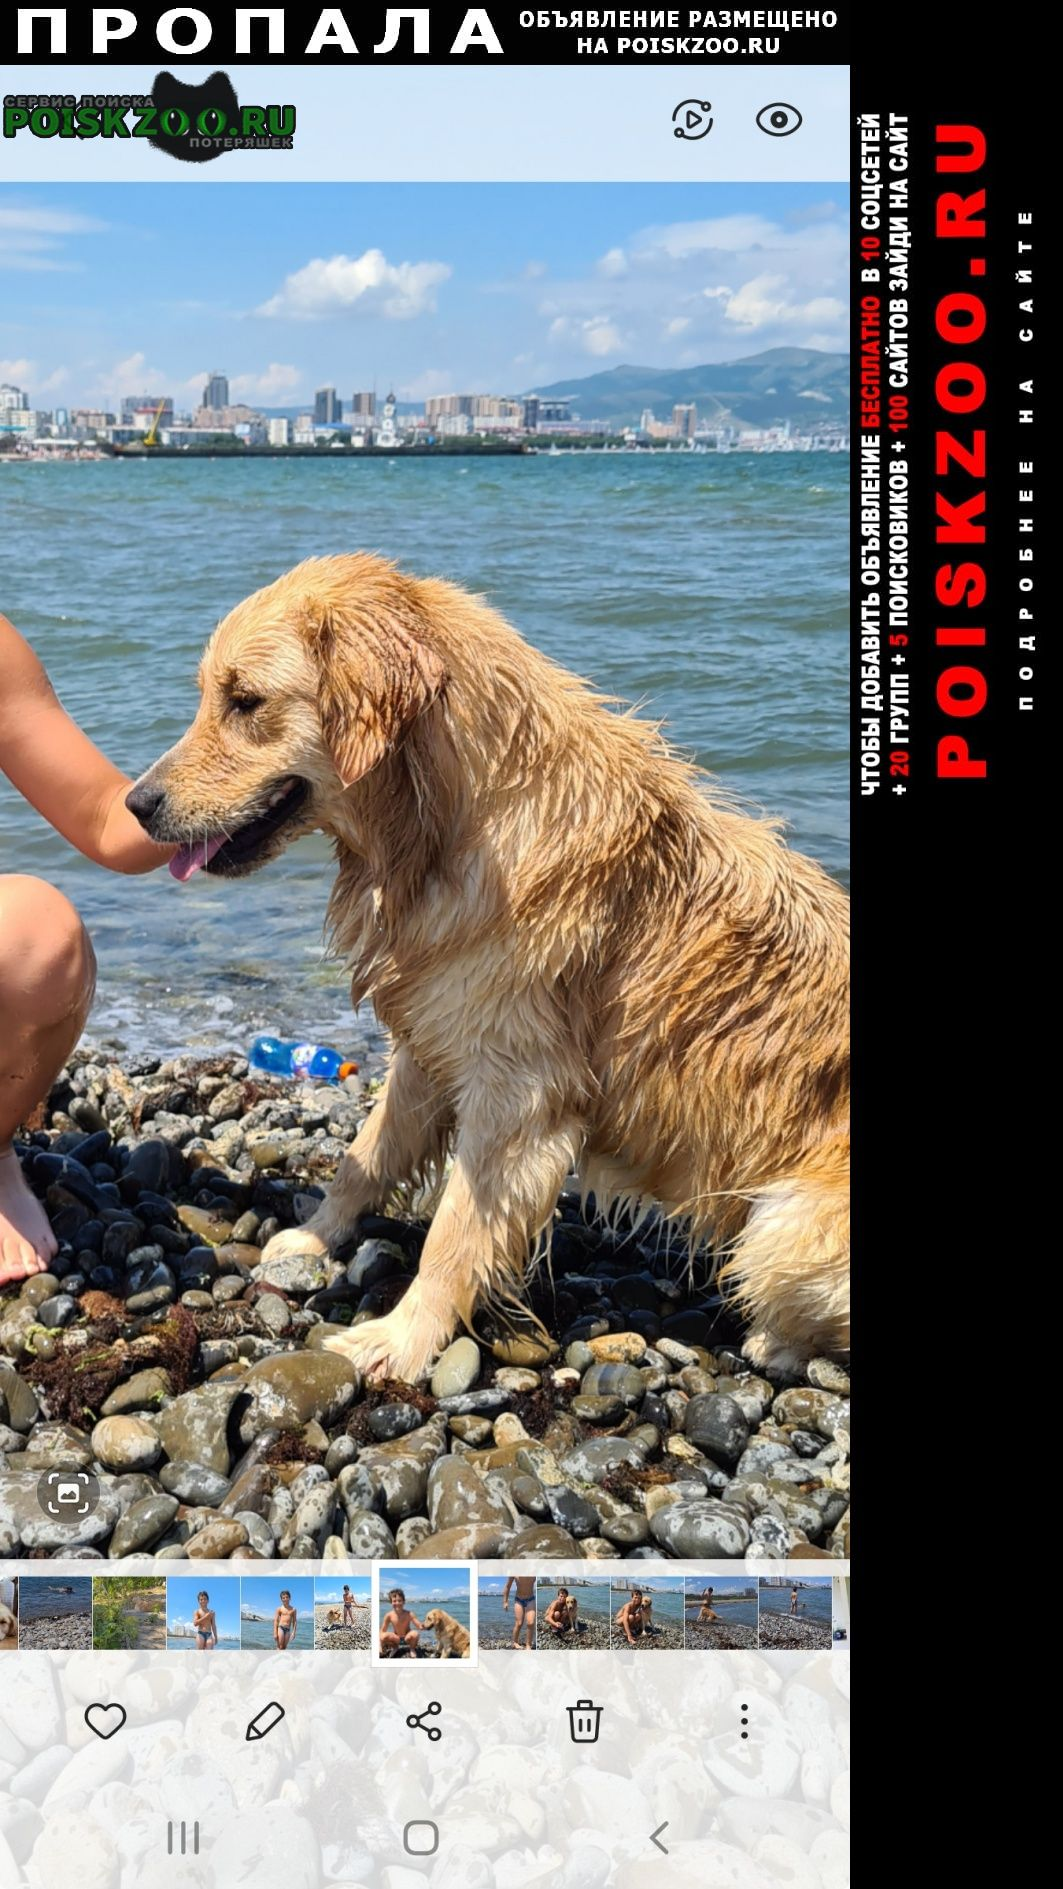 Пропала собака ретривер Новороссийск